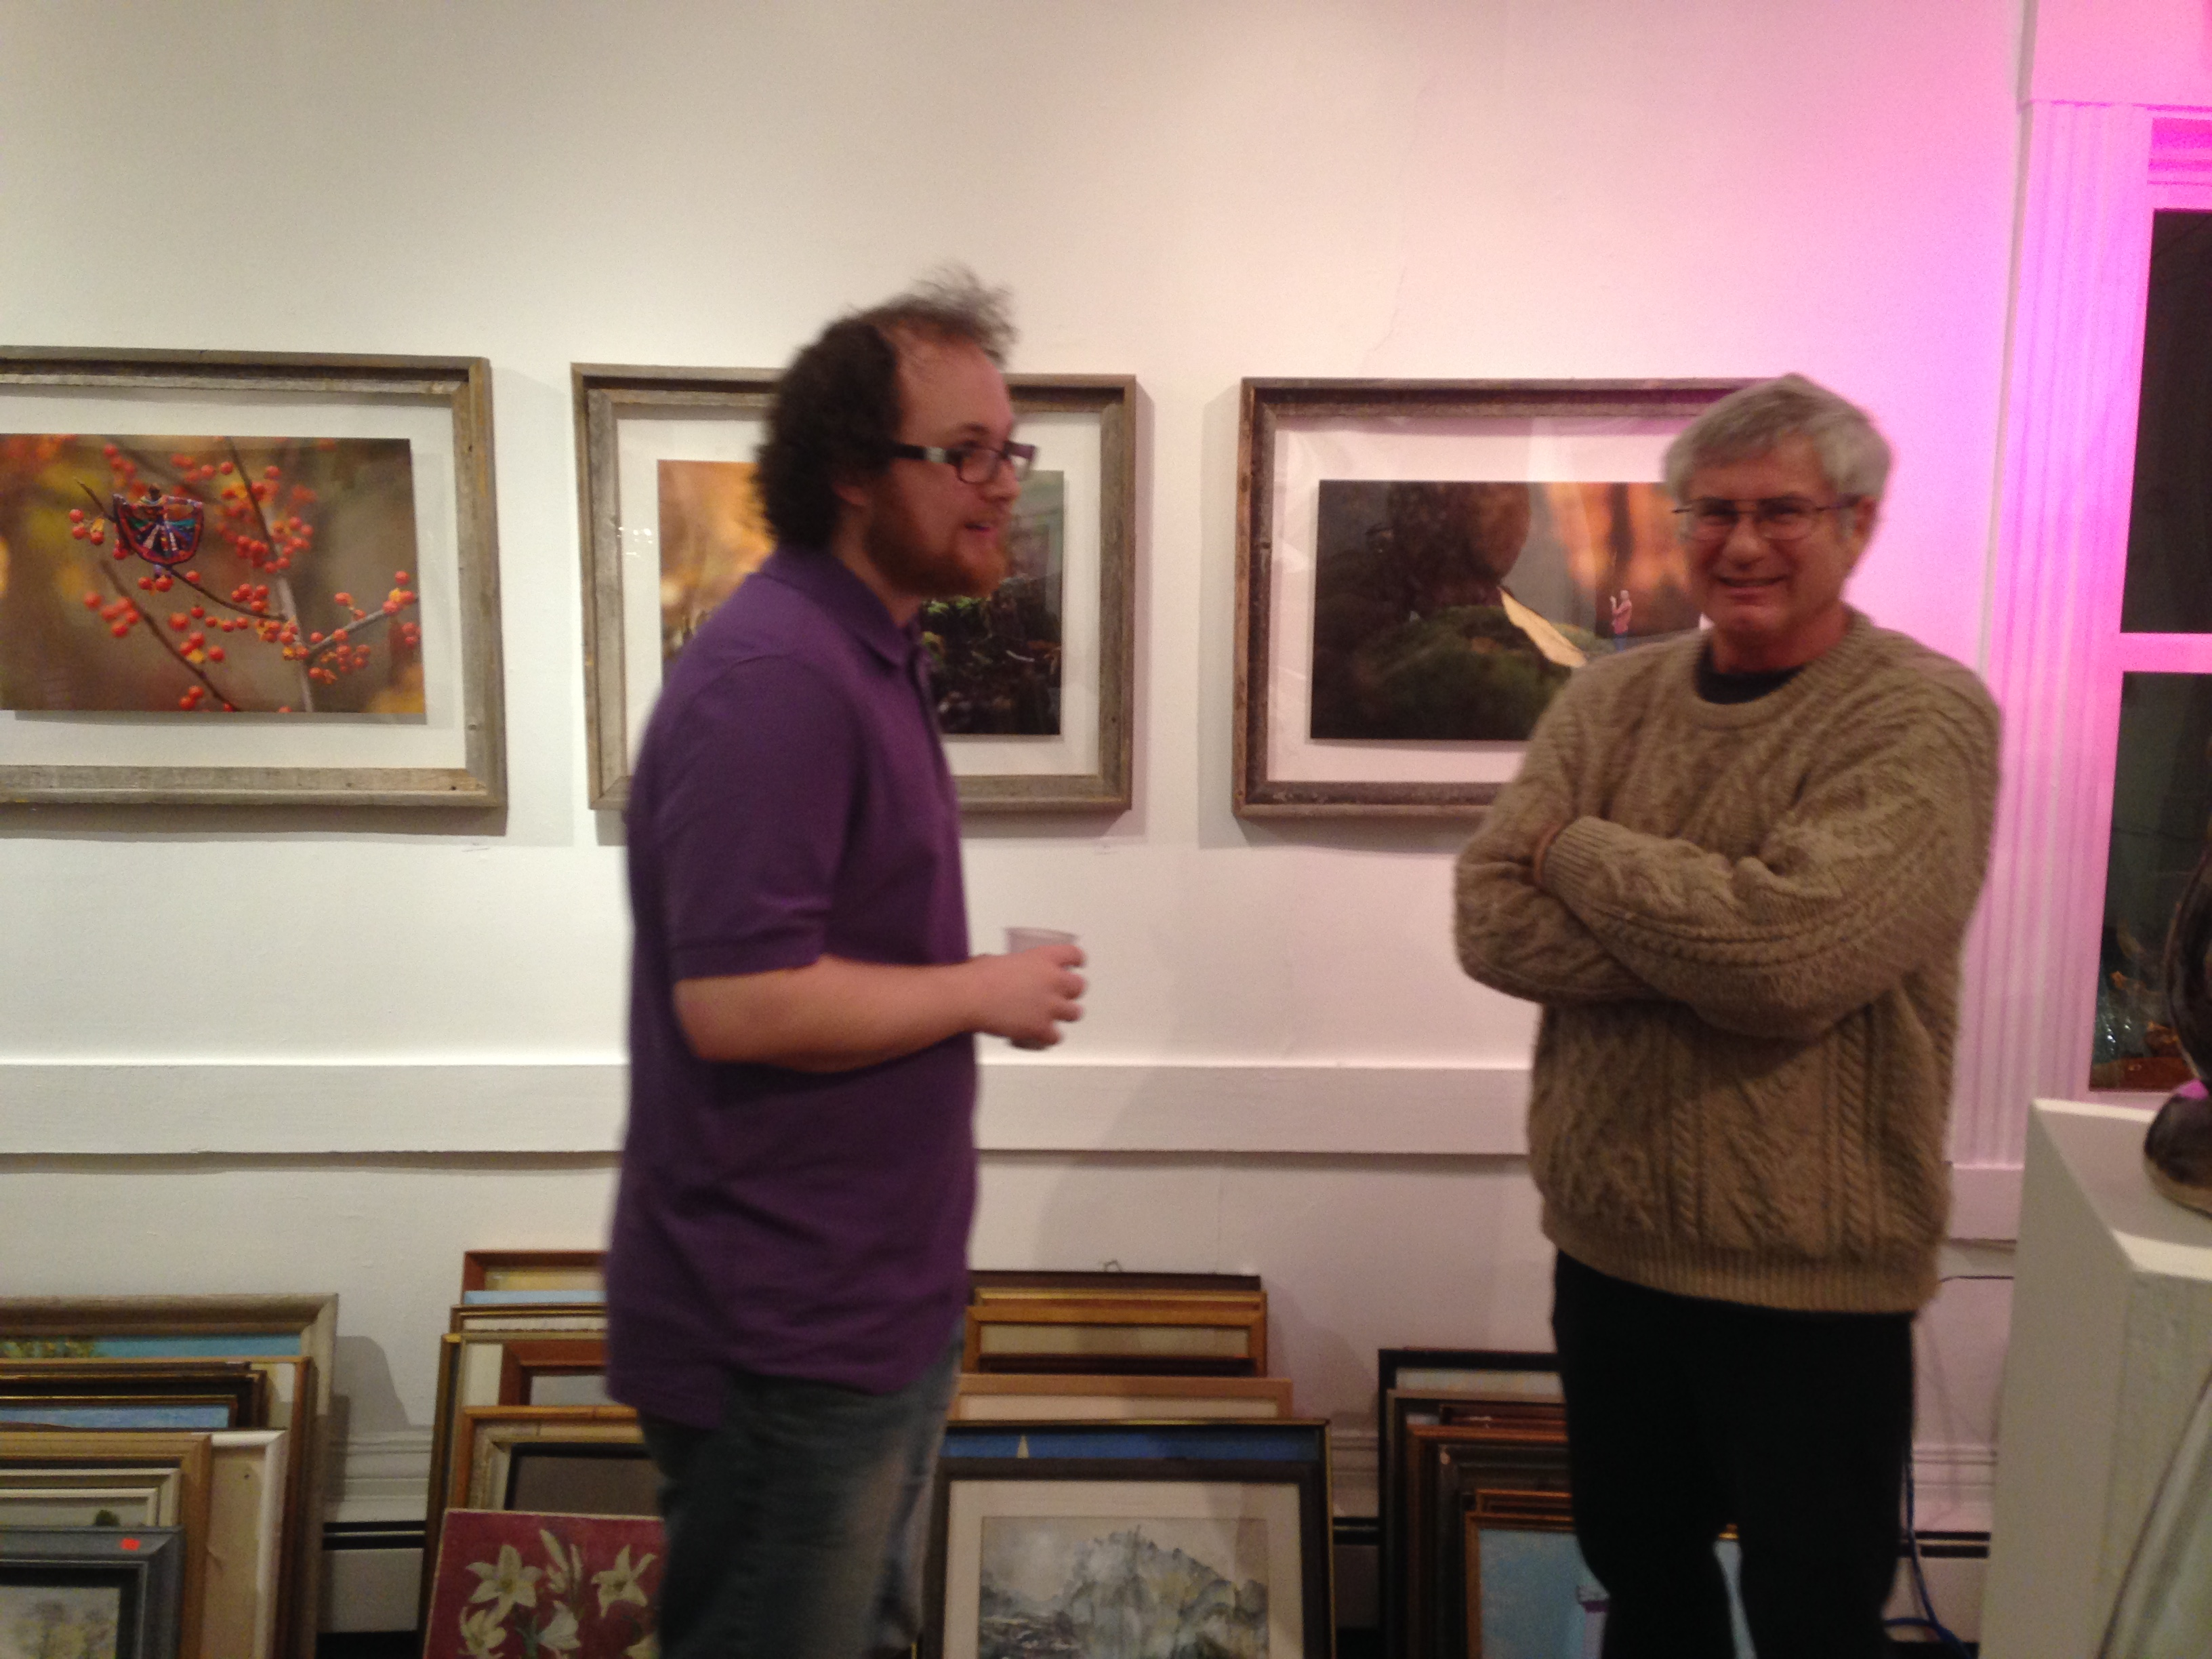 Owner of Yak Arts, Bob (Right)